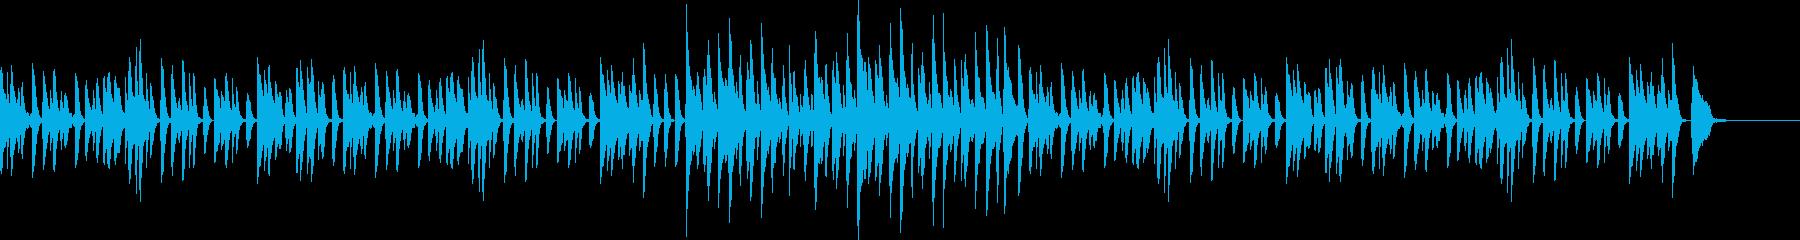 Retro Pianoの再生済みの波形